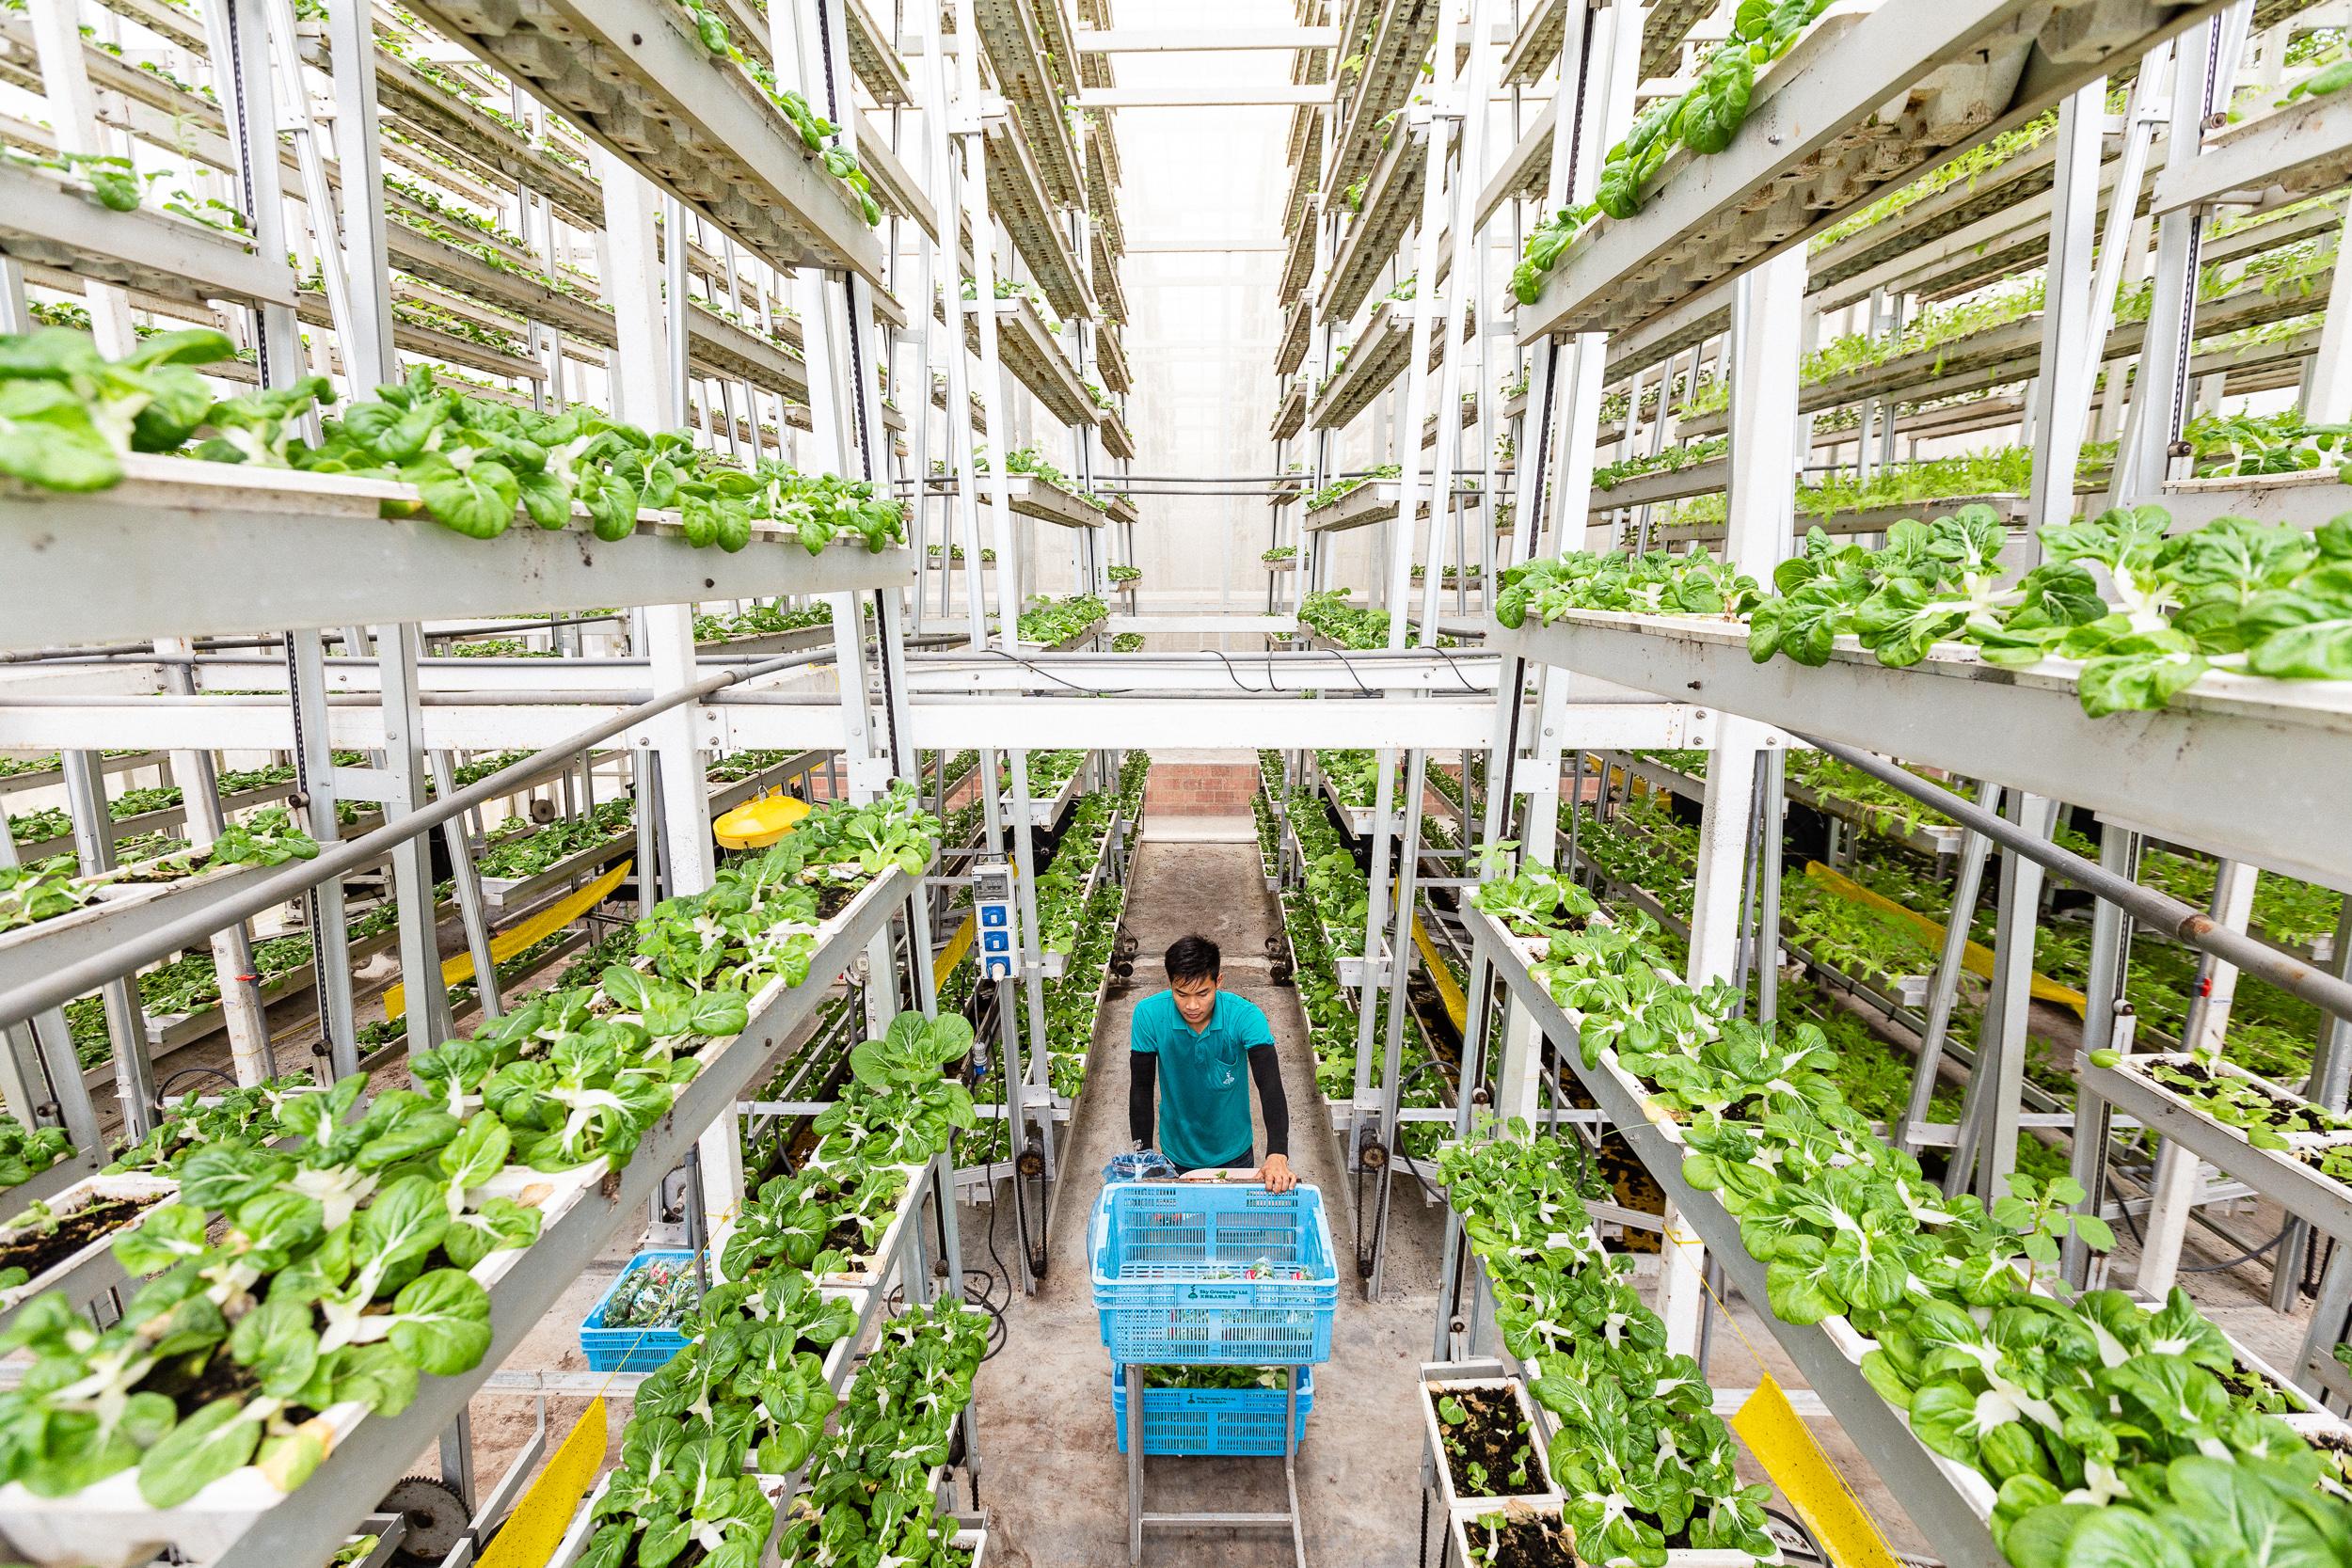 singapore-commercial-editorial-photographer-zainal-zainal-vertical-farming-skygreens-pictet-03.jpg